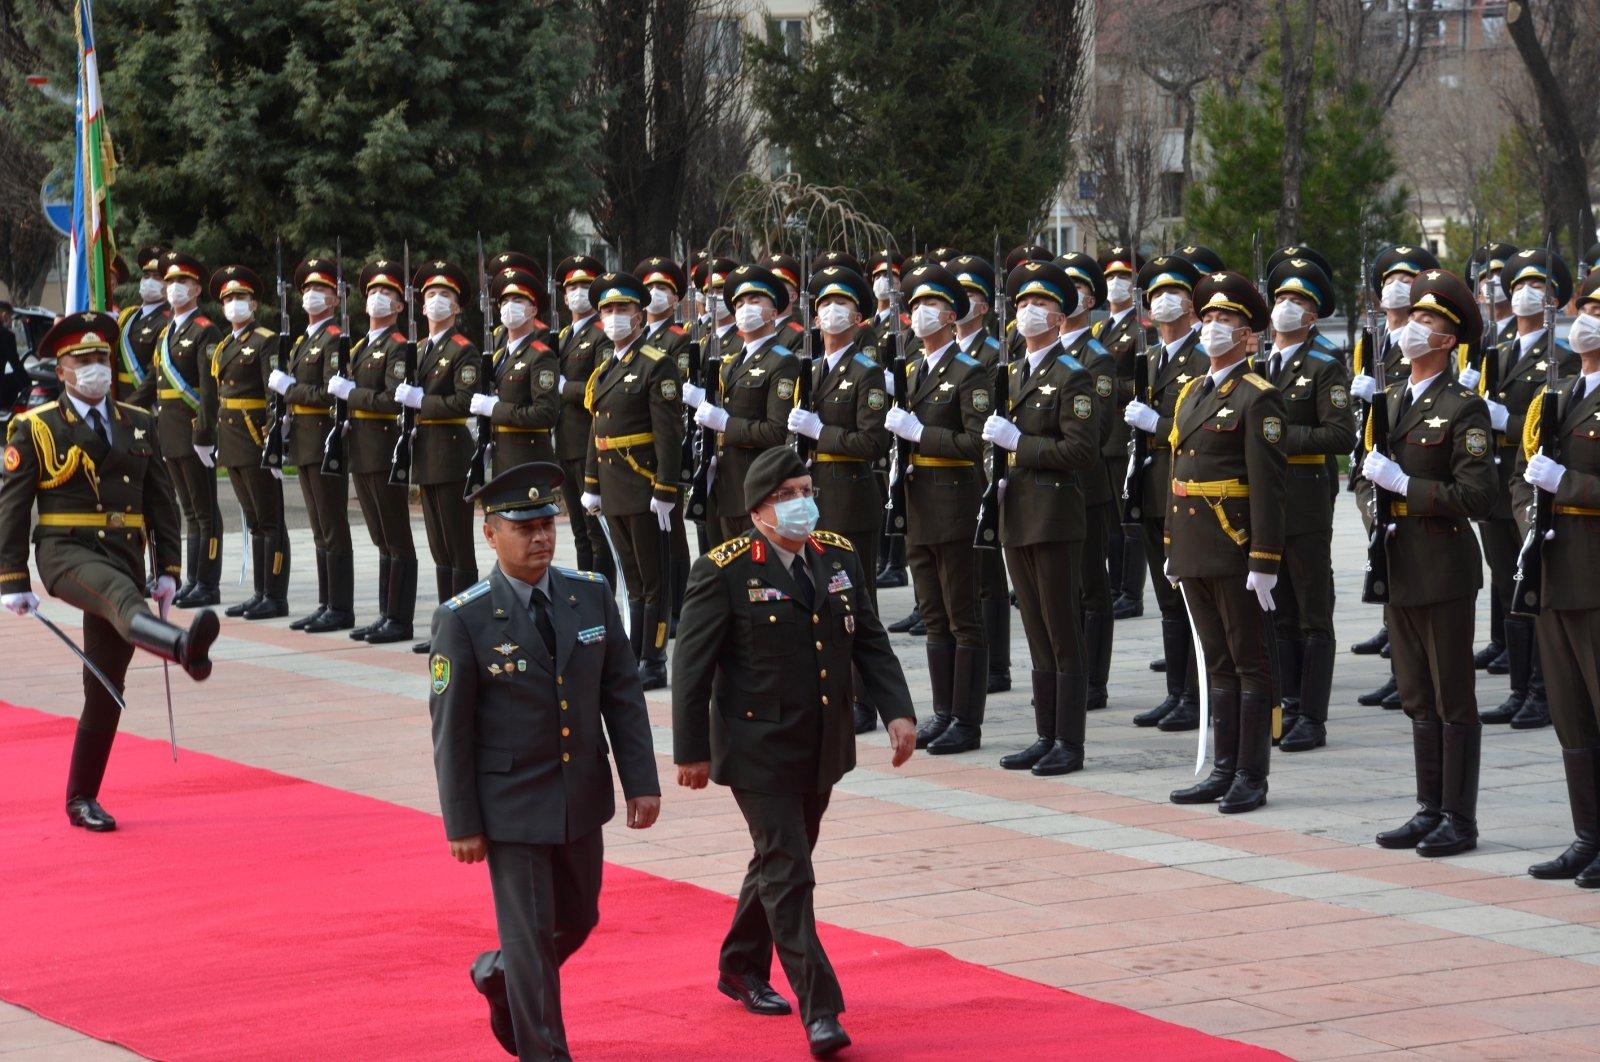 Chief of General Staff Gen. Yaşar Güler attends the official ceremony in the Uzbek city of Tashkent, March 23, 2021 (AA Photo)